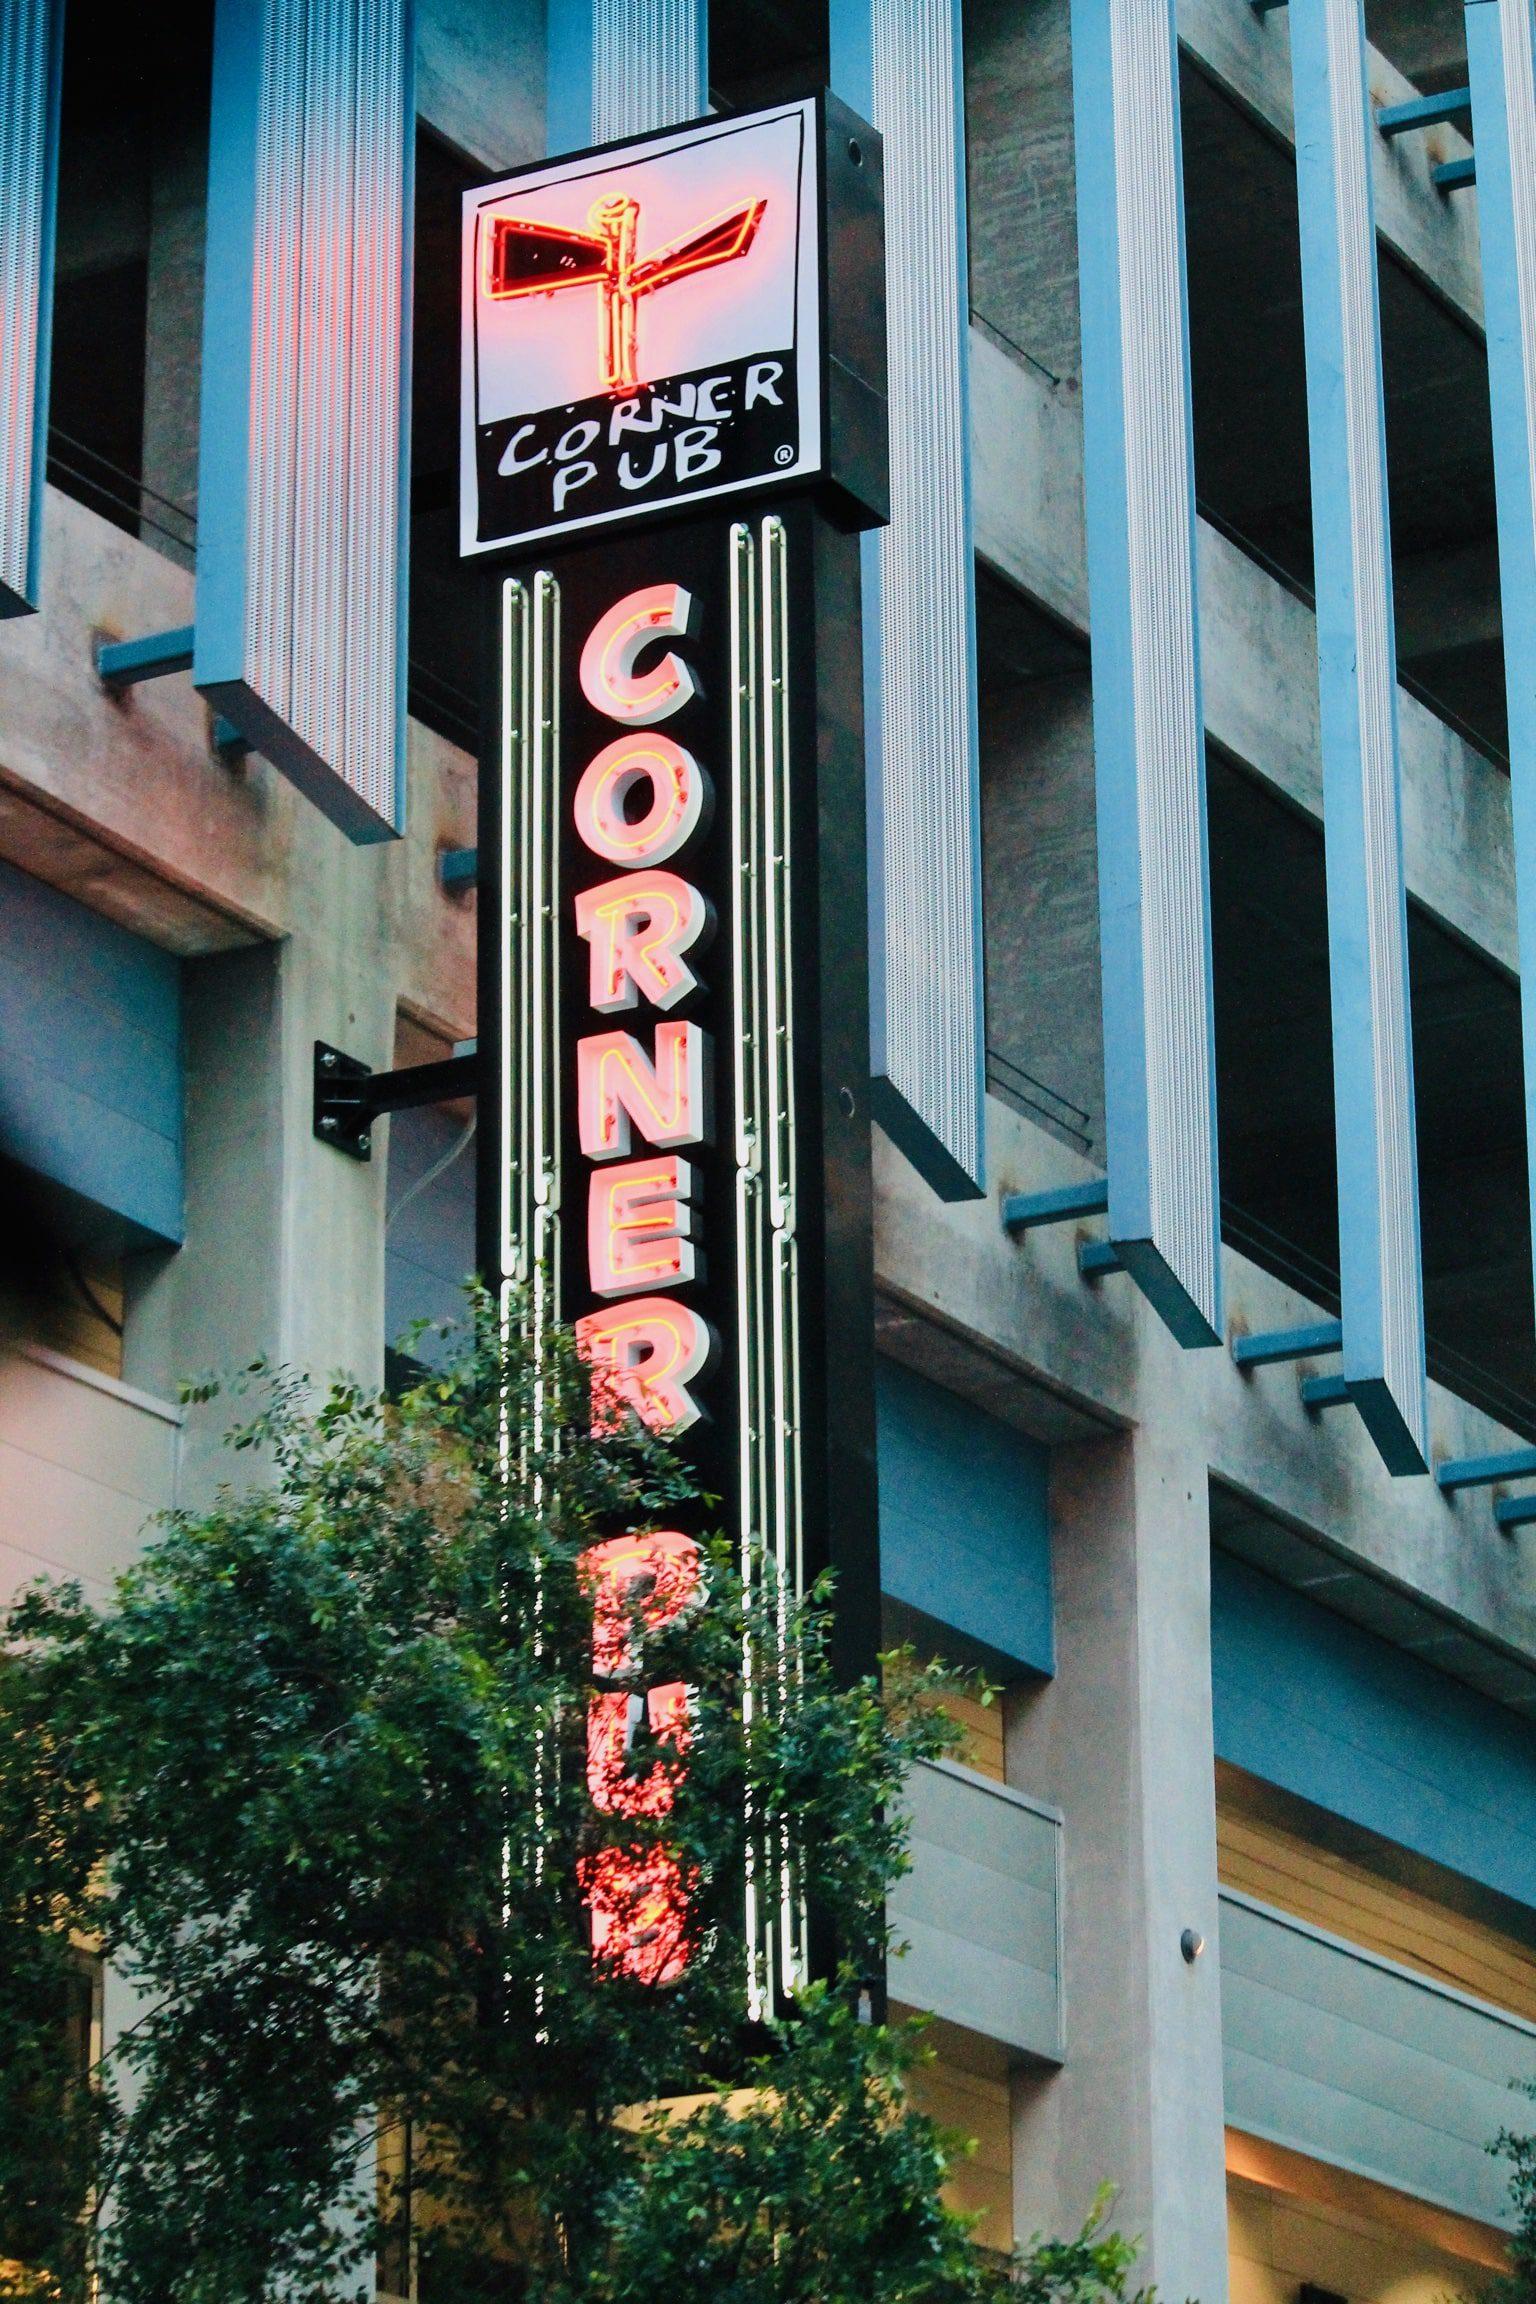 led restaurant sign in Nashville with led conversion